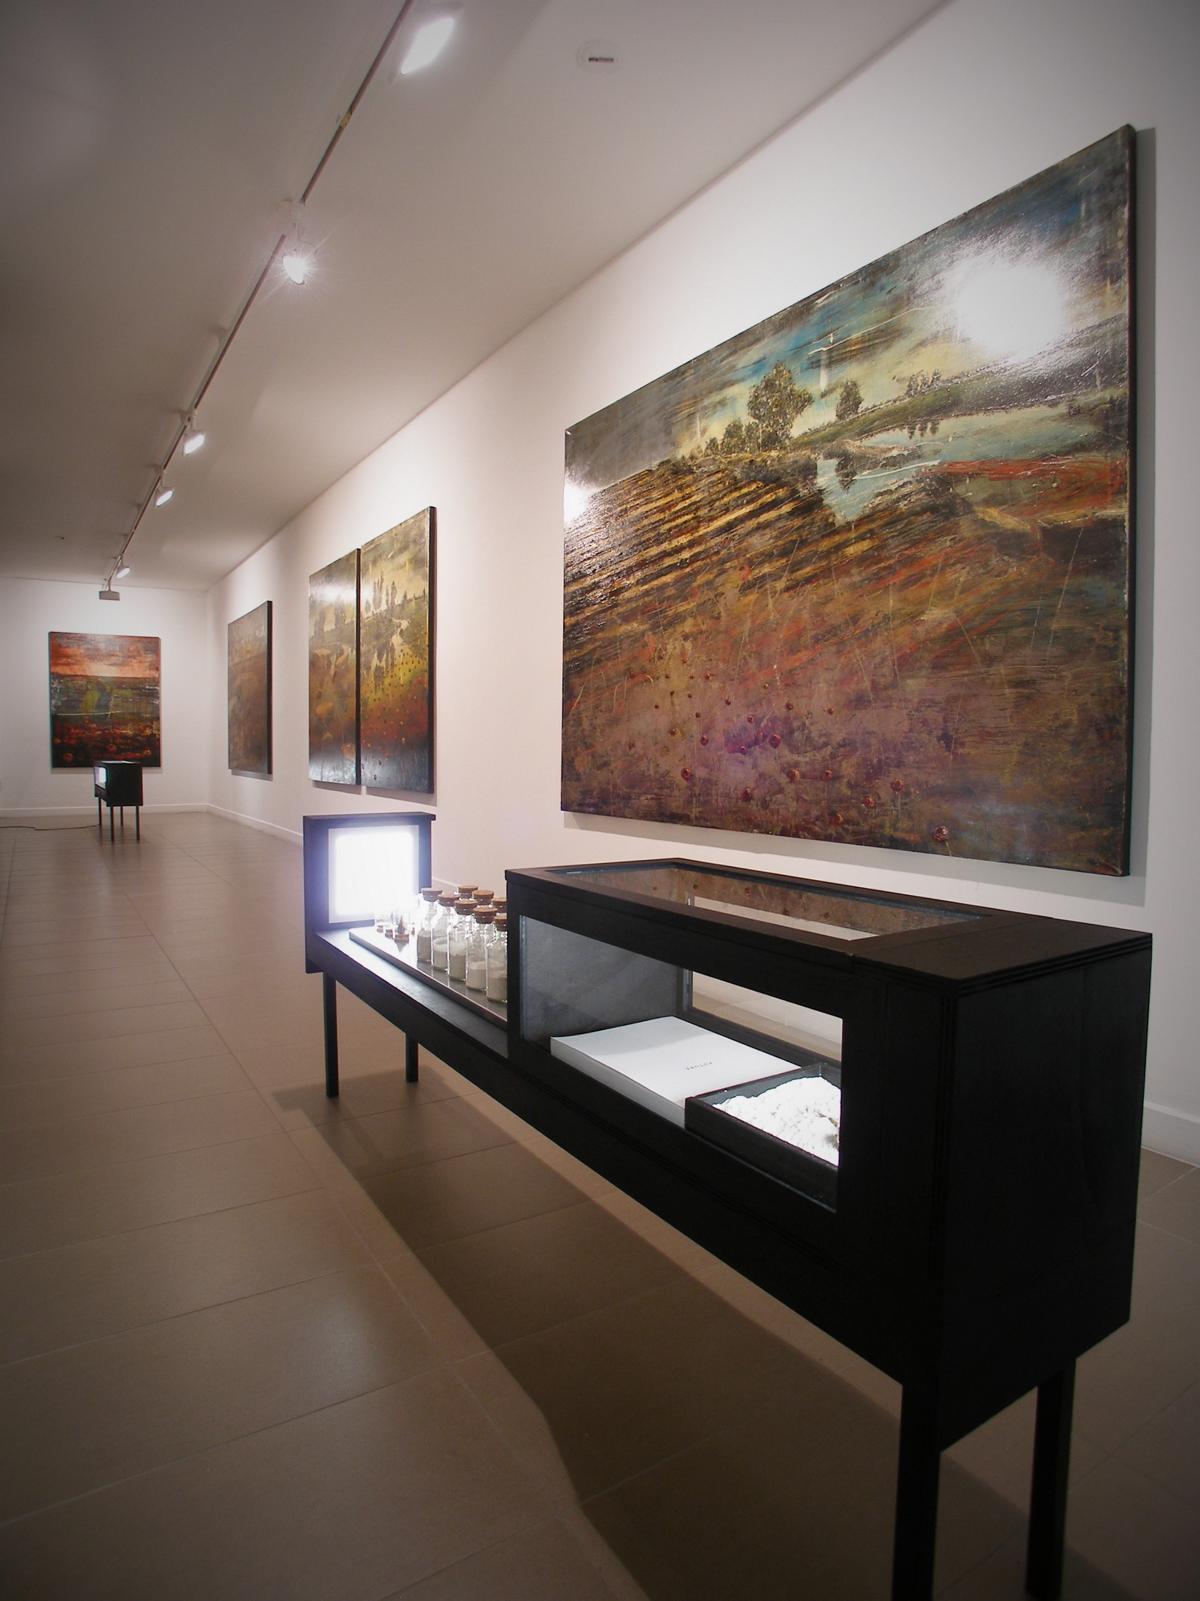 Jernej Forbici, Prima-del-dopo-veduta-mostra-Galleria-Romberg-Latina-